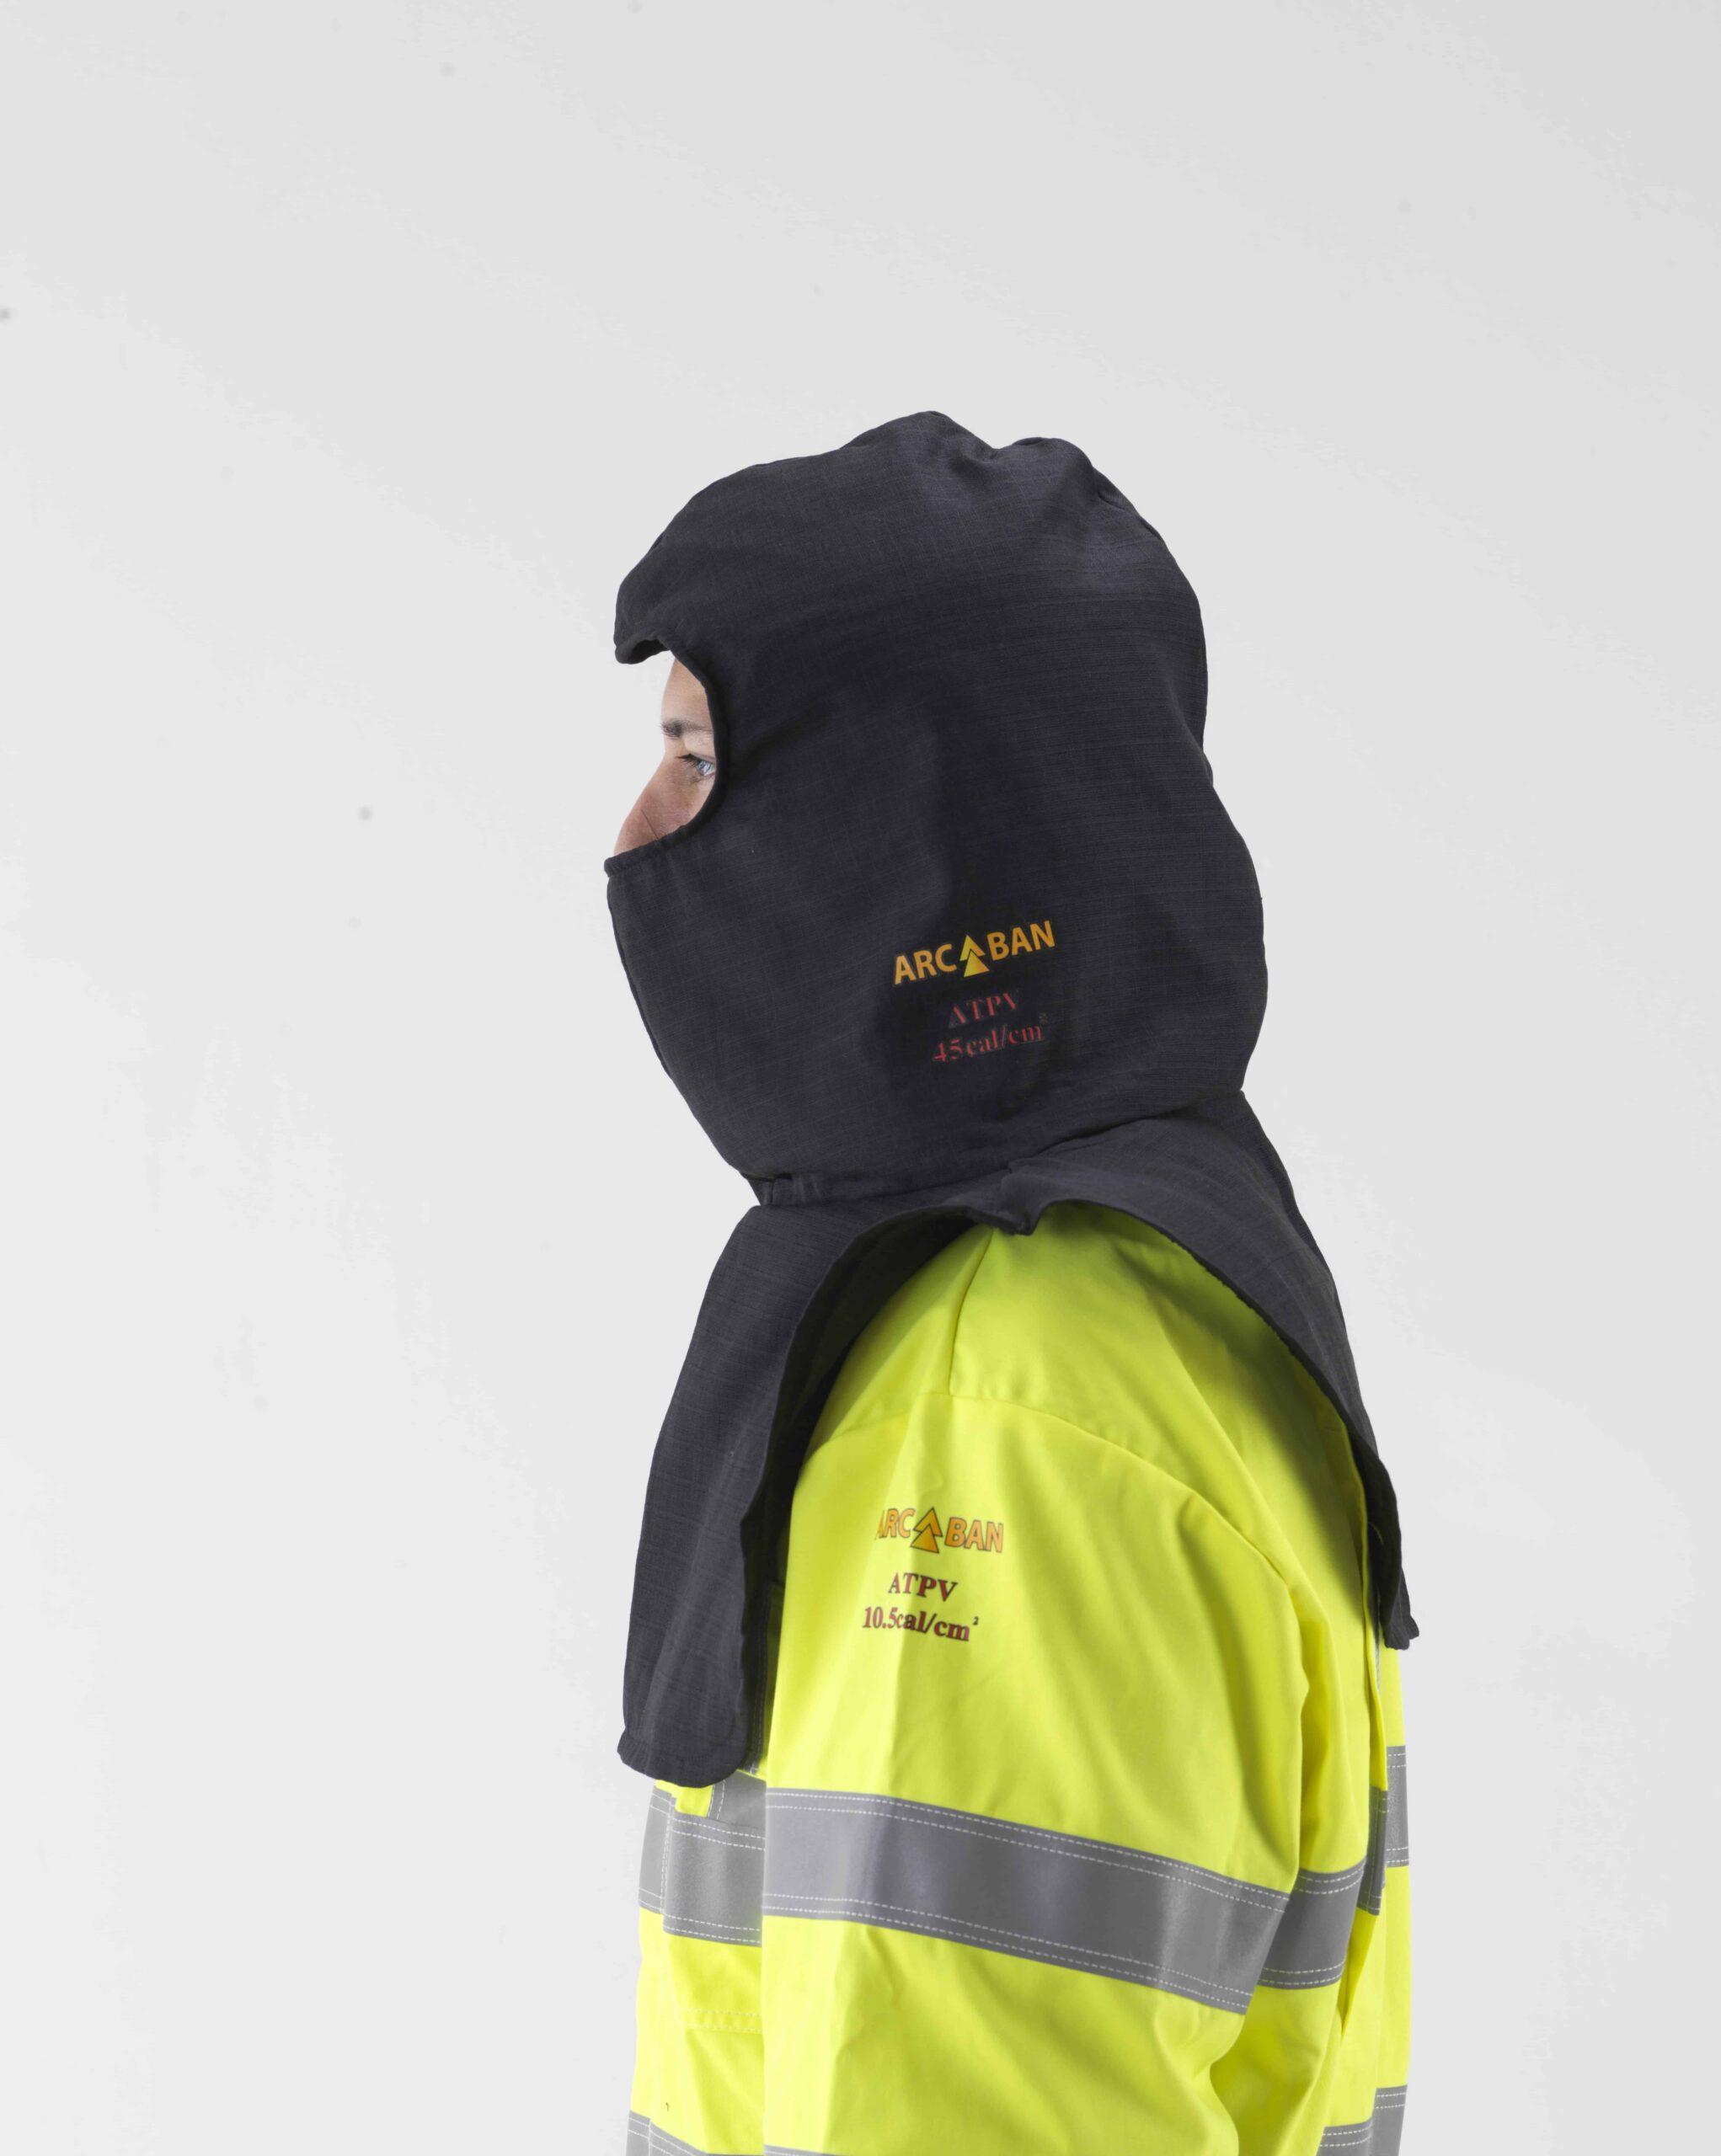 Arc flash protection balaclava hood side view